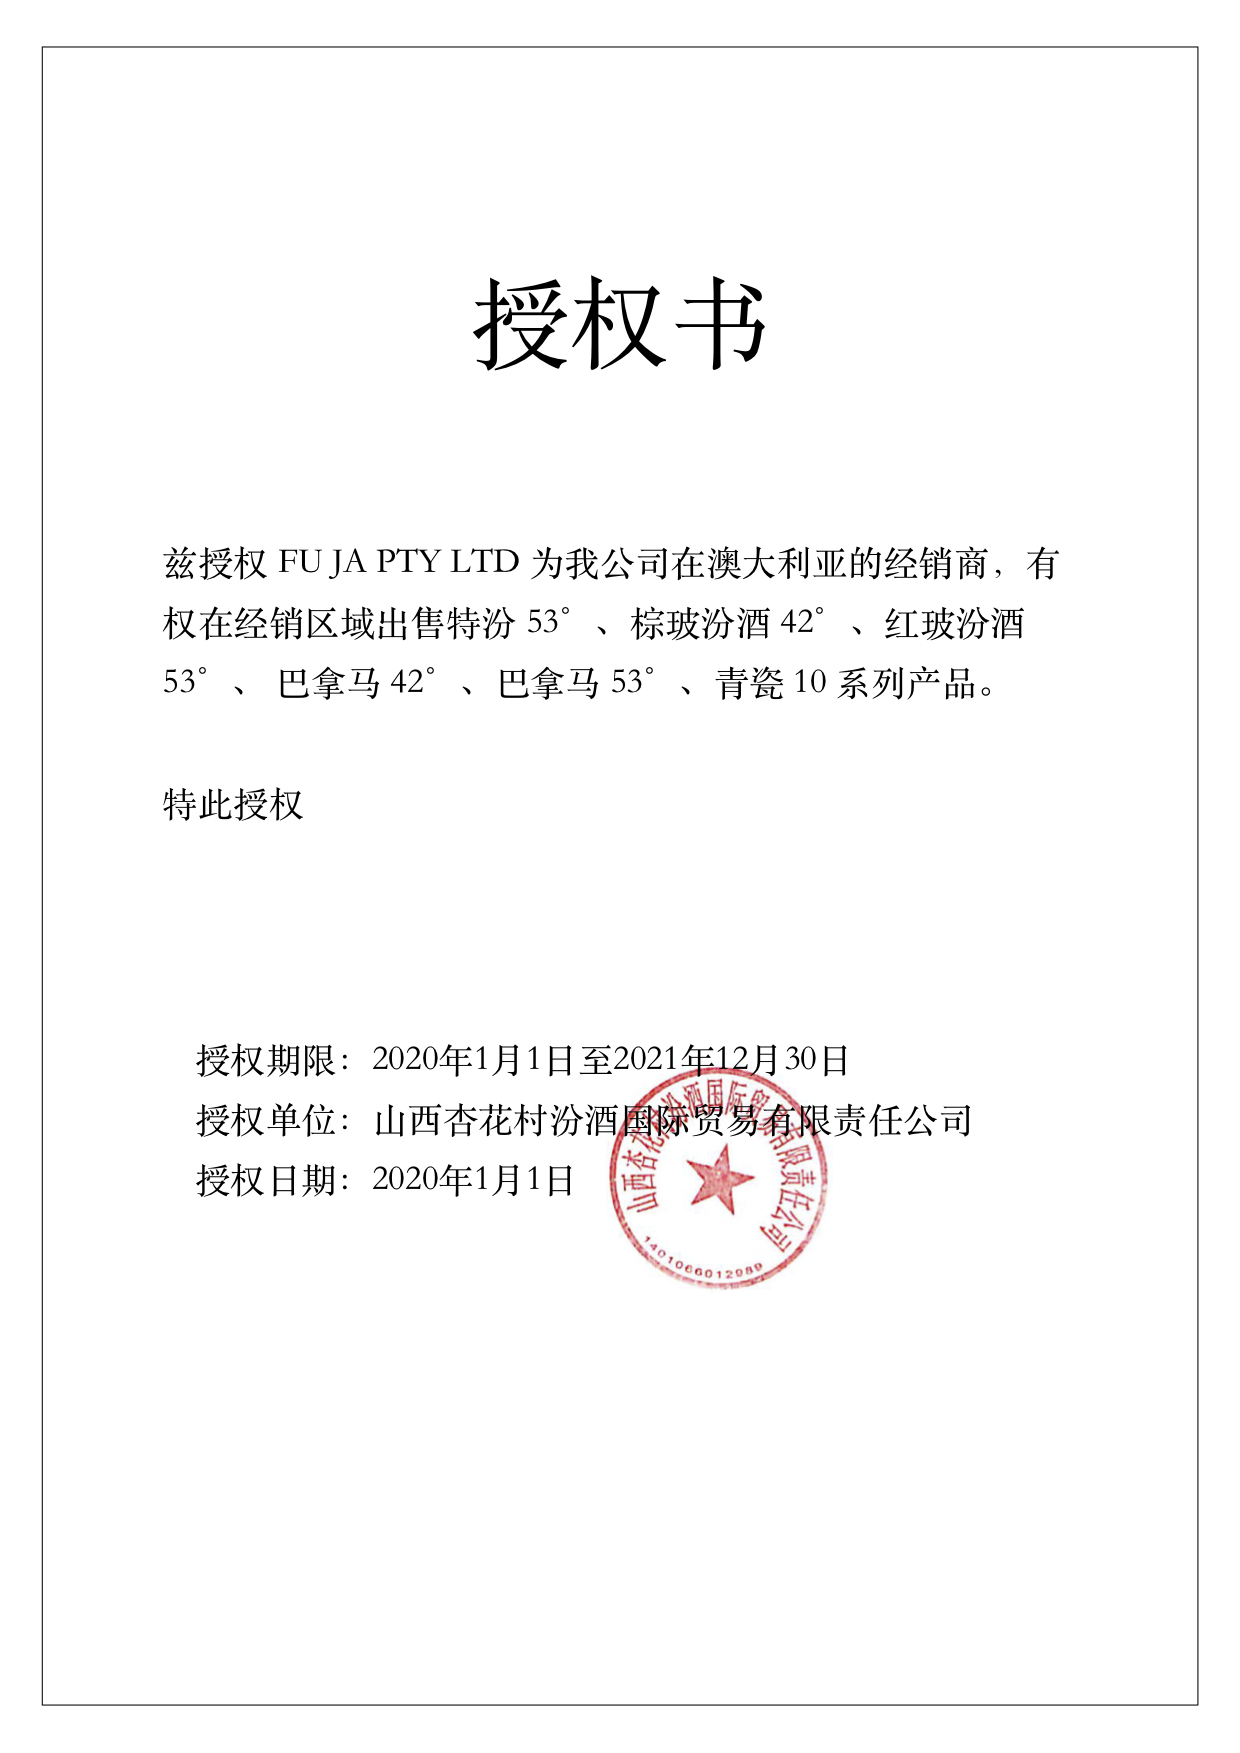 grant_certificate